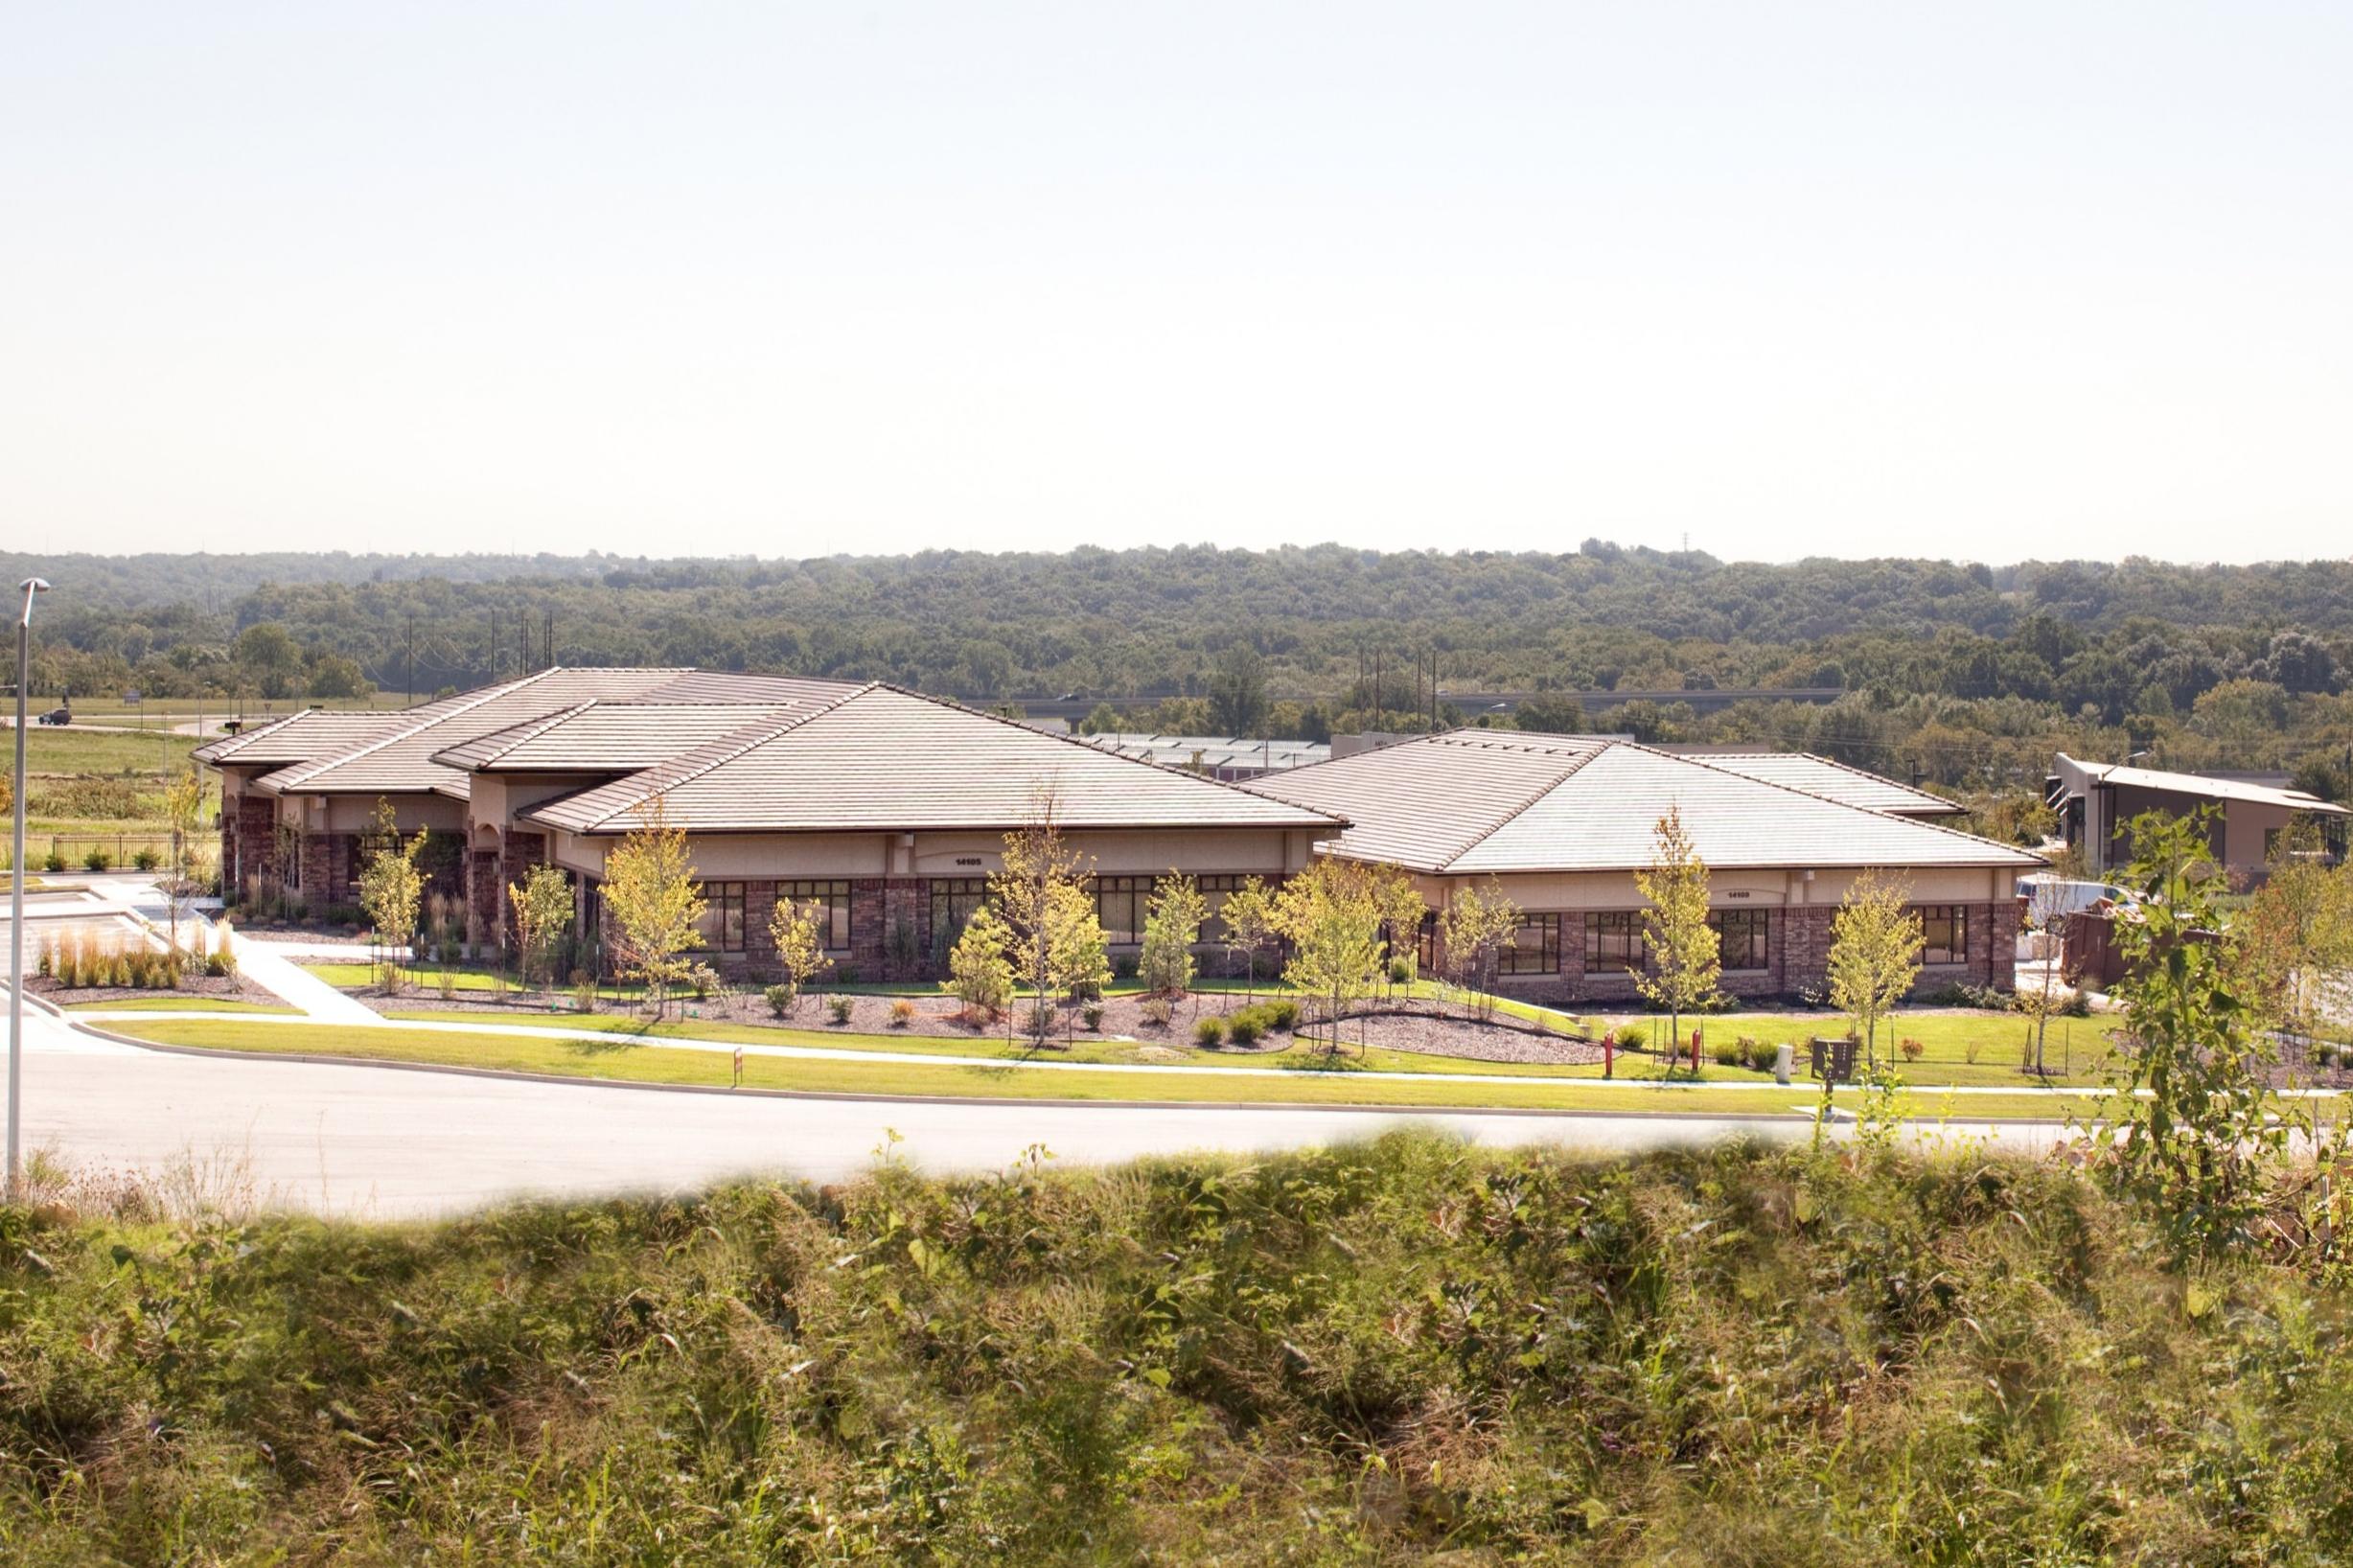 View of Centennial Park corporate office park